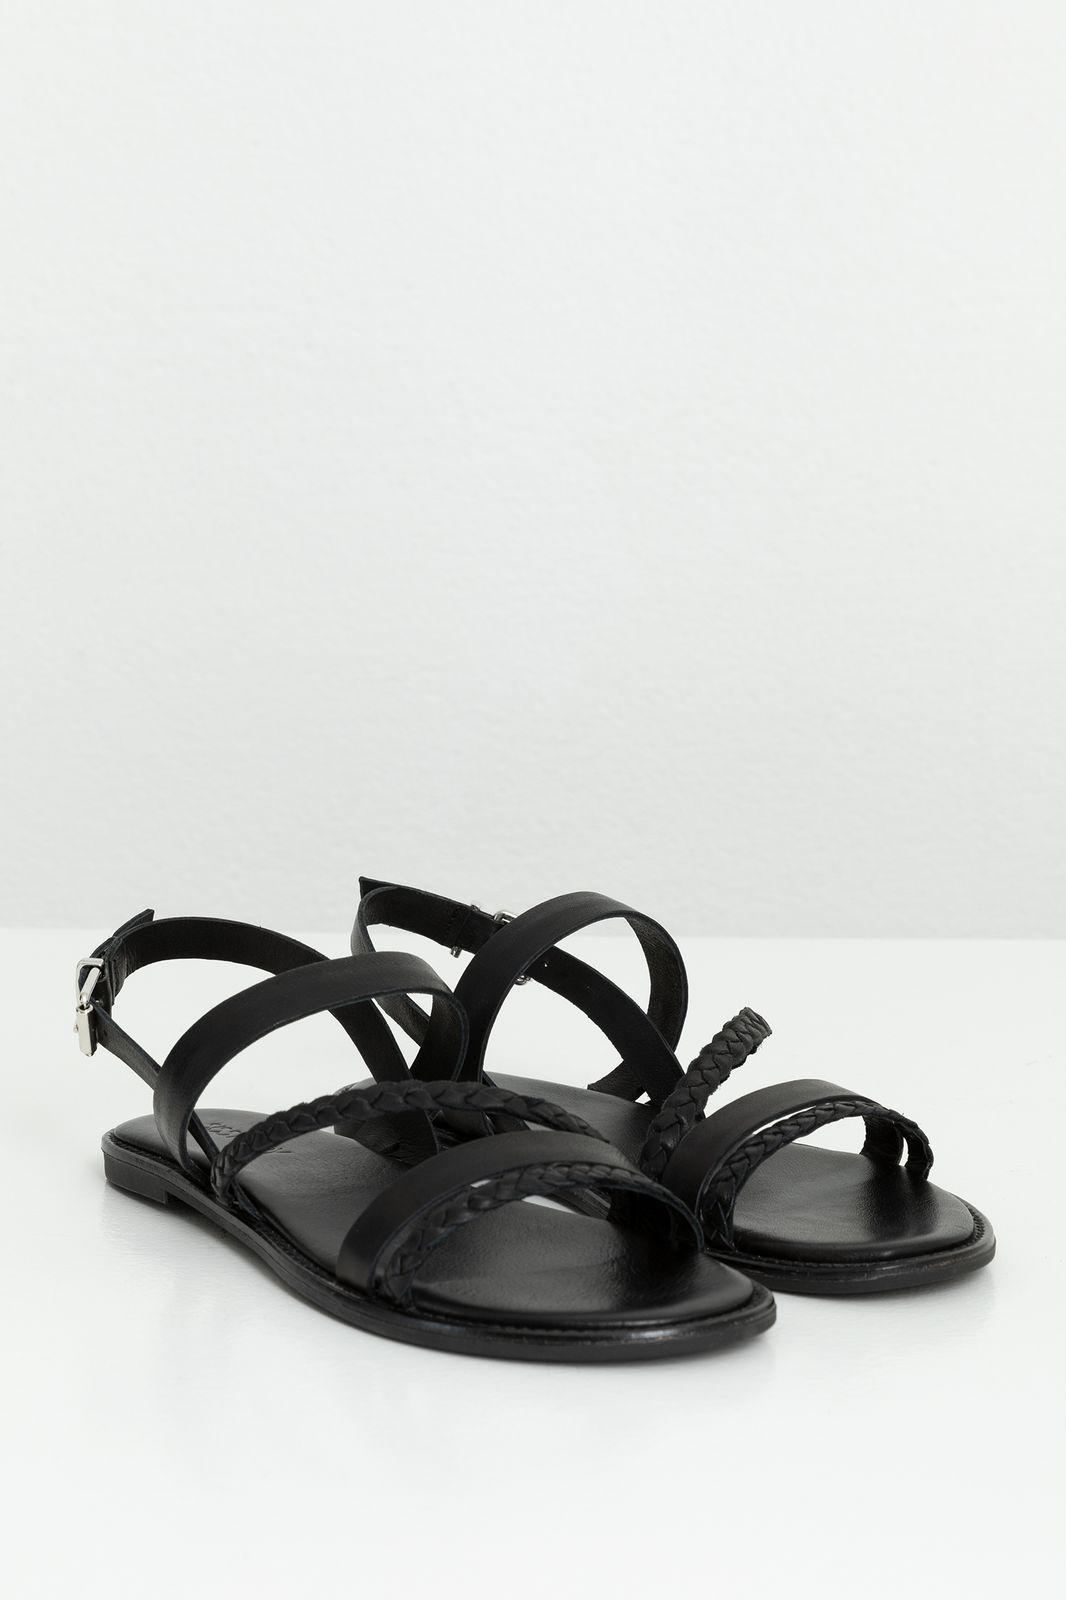 Zwarte leren sandaal gevlochten - Dames | Sissy-Boy